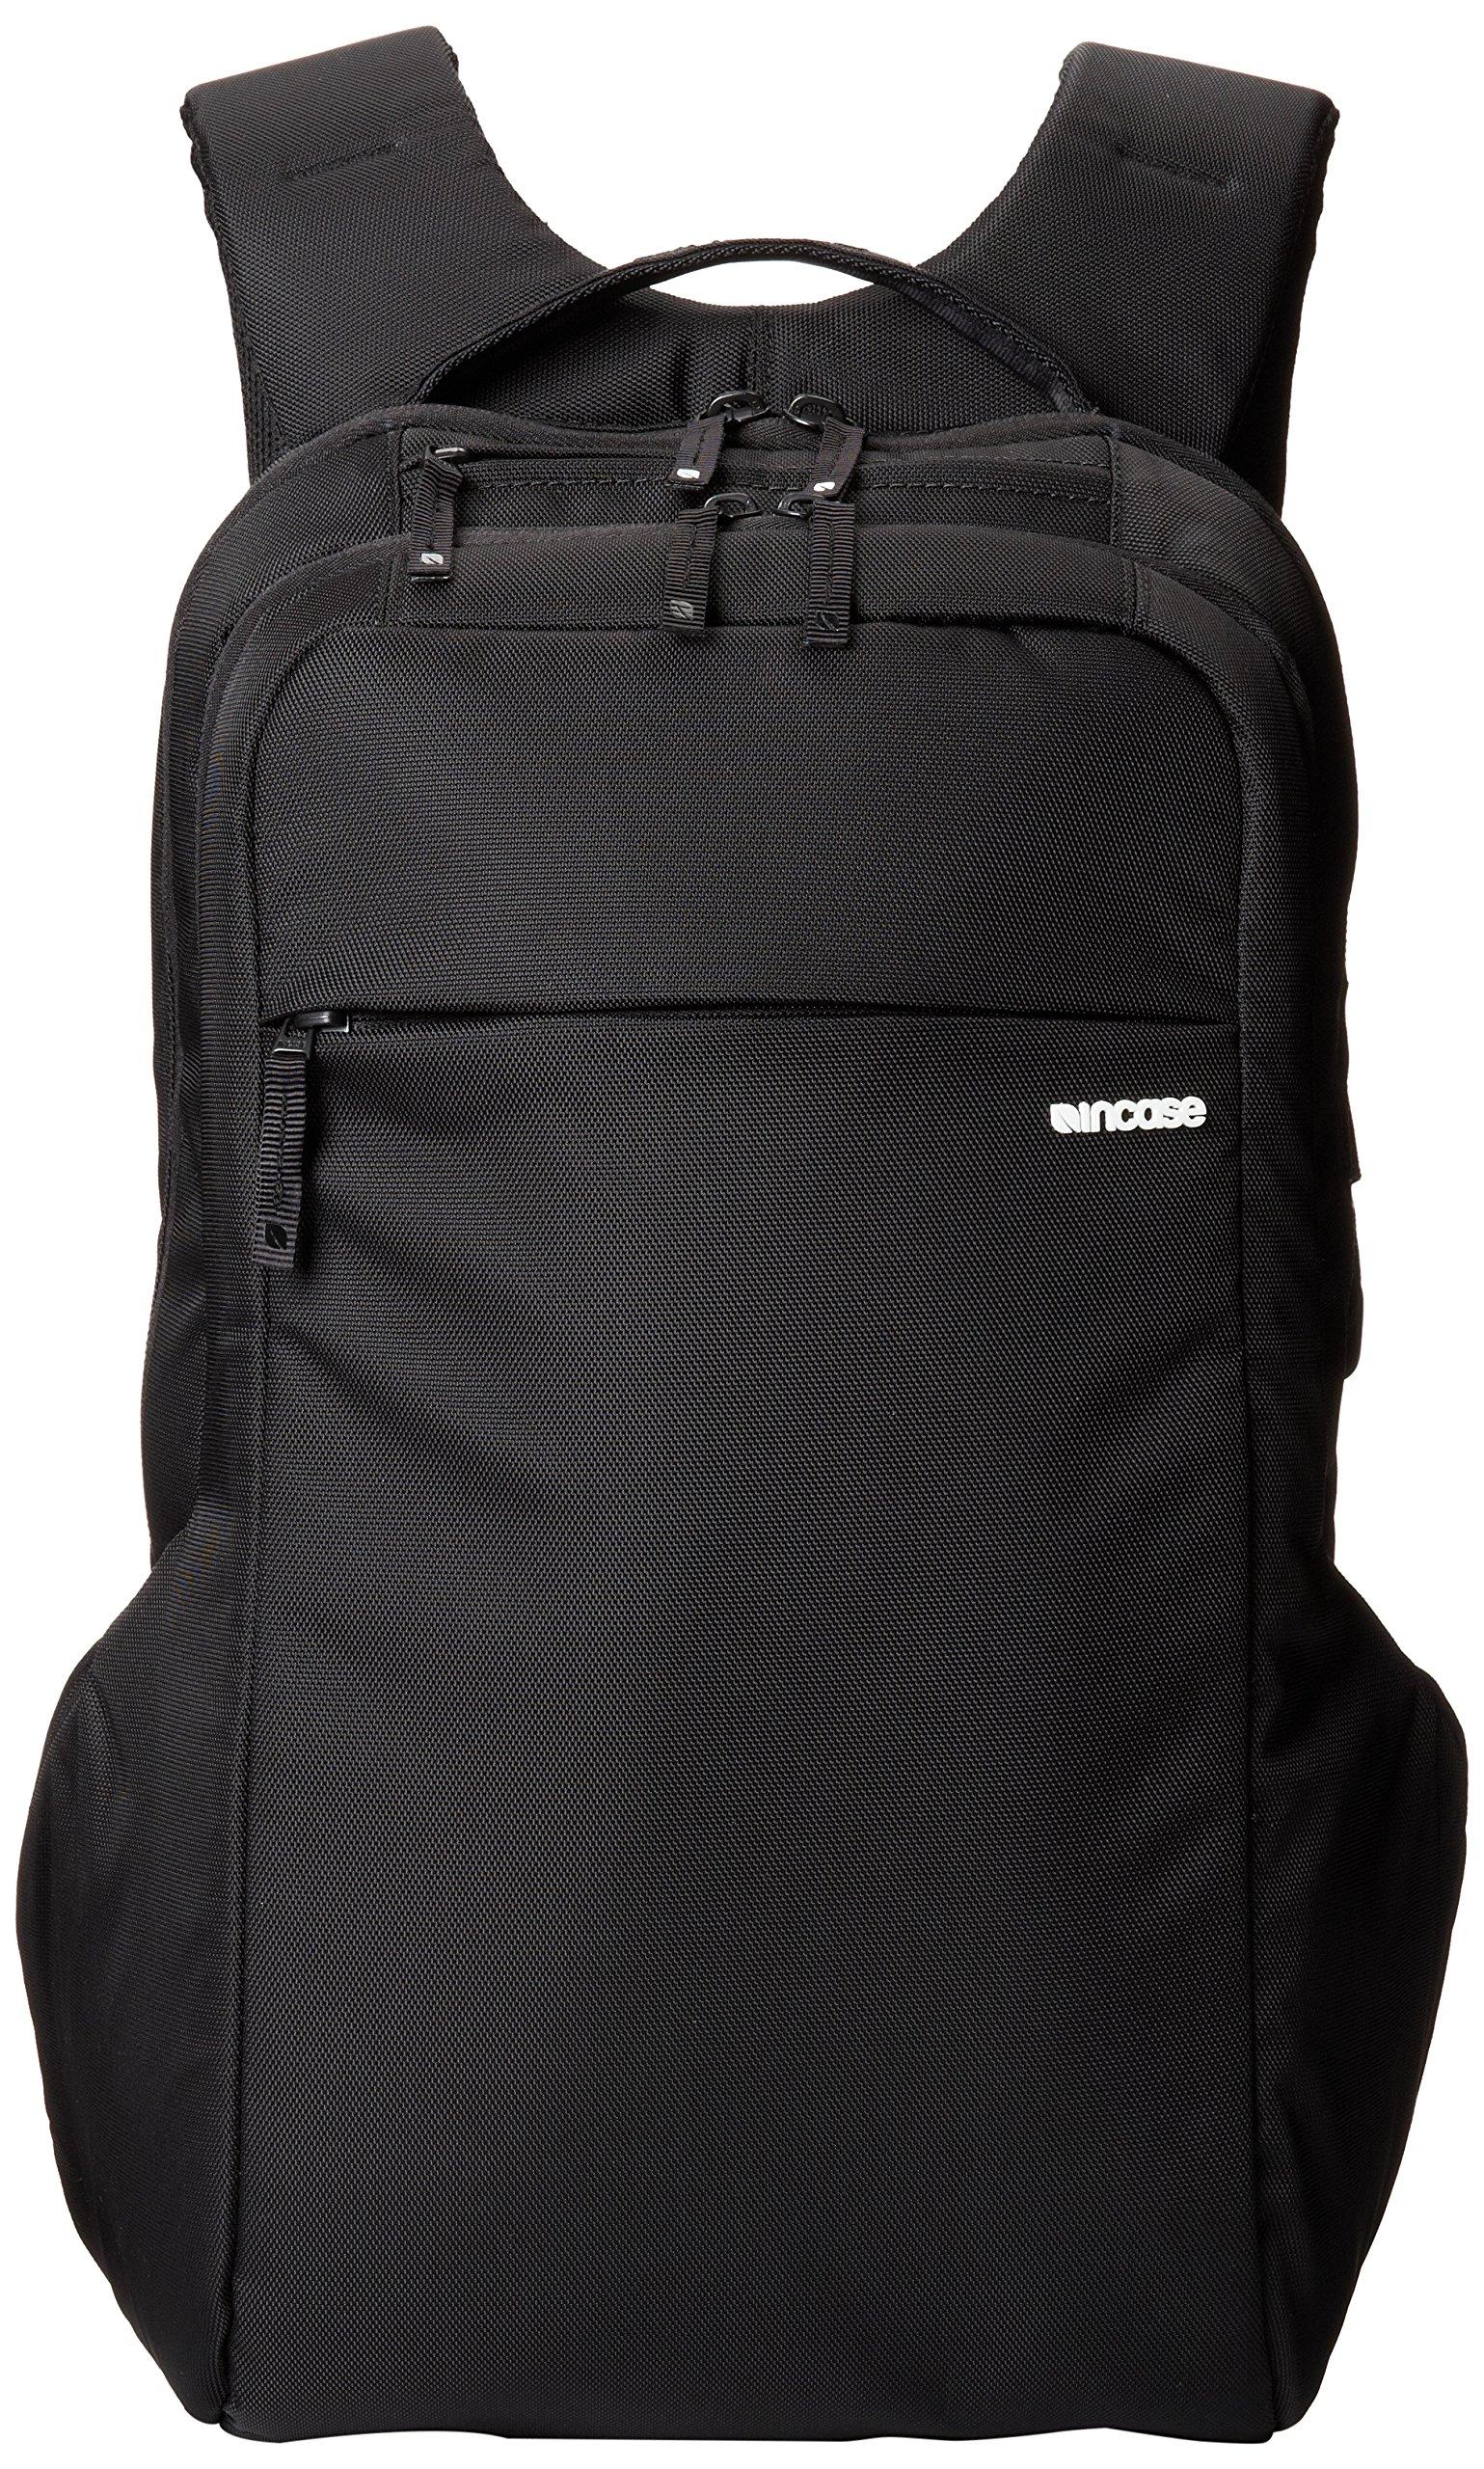 Incase Icon Slim Pack, 15.6'' Laptop Backpack, Black, CL55535